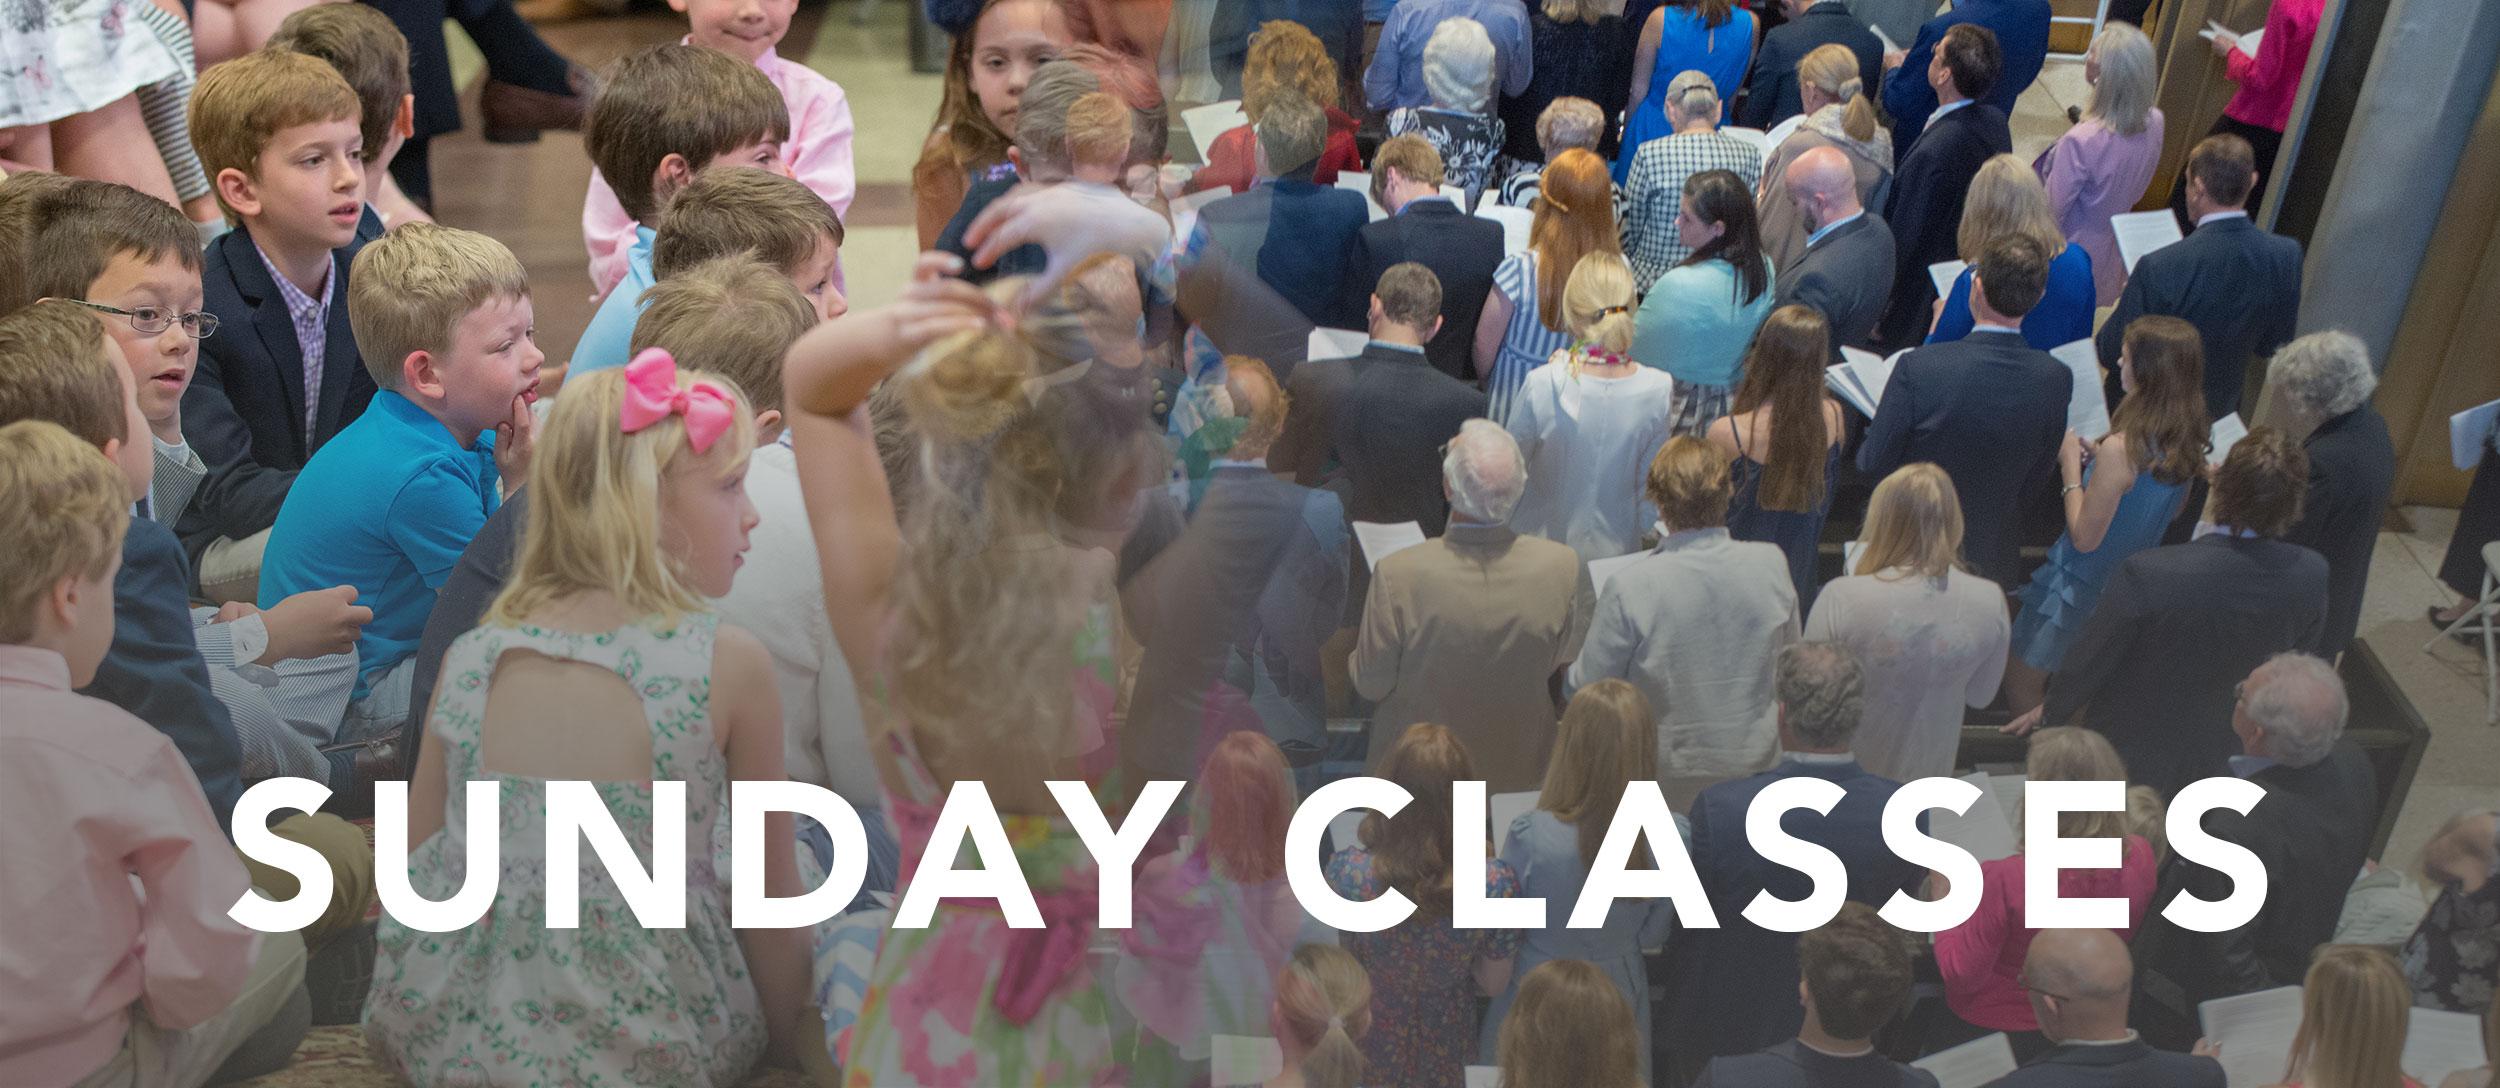 sunday-classes-masthead_321